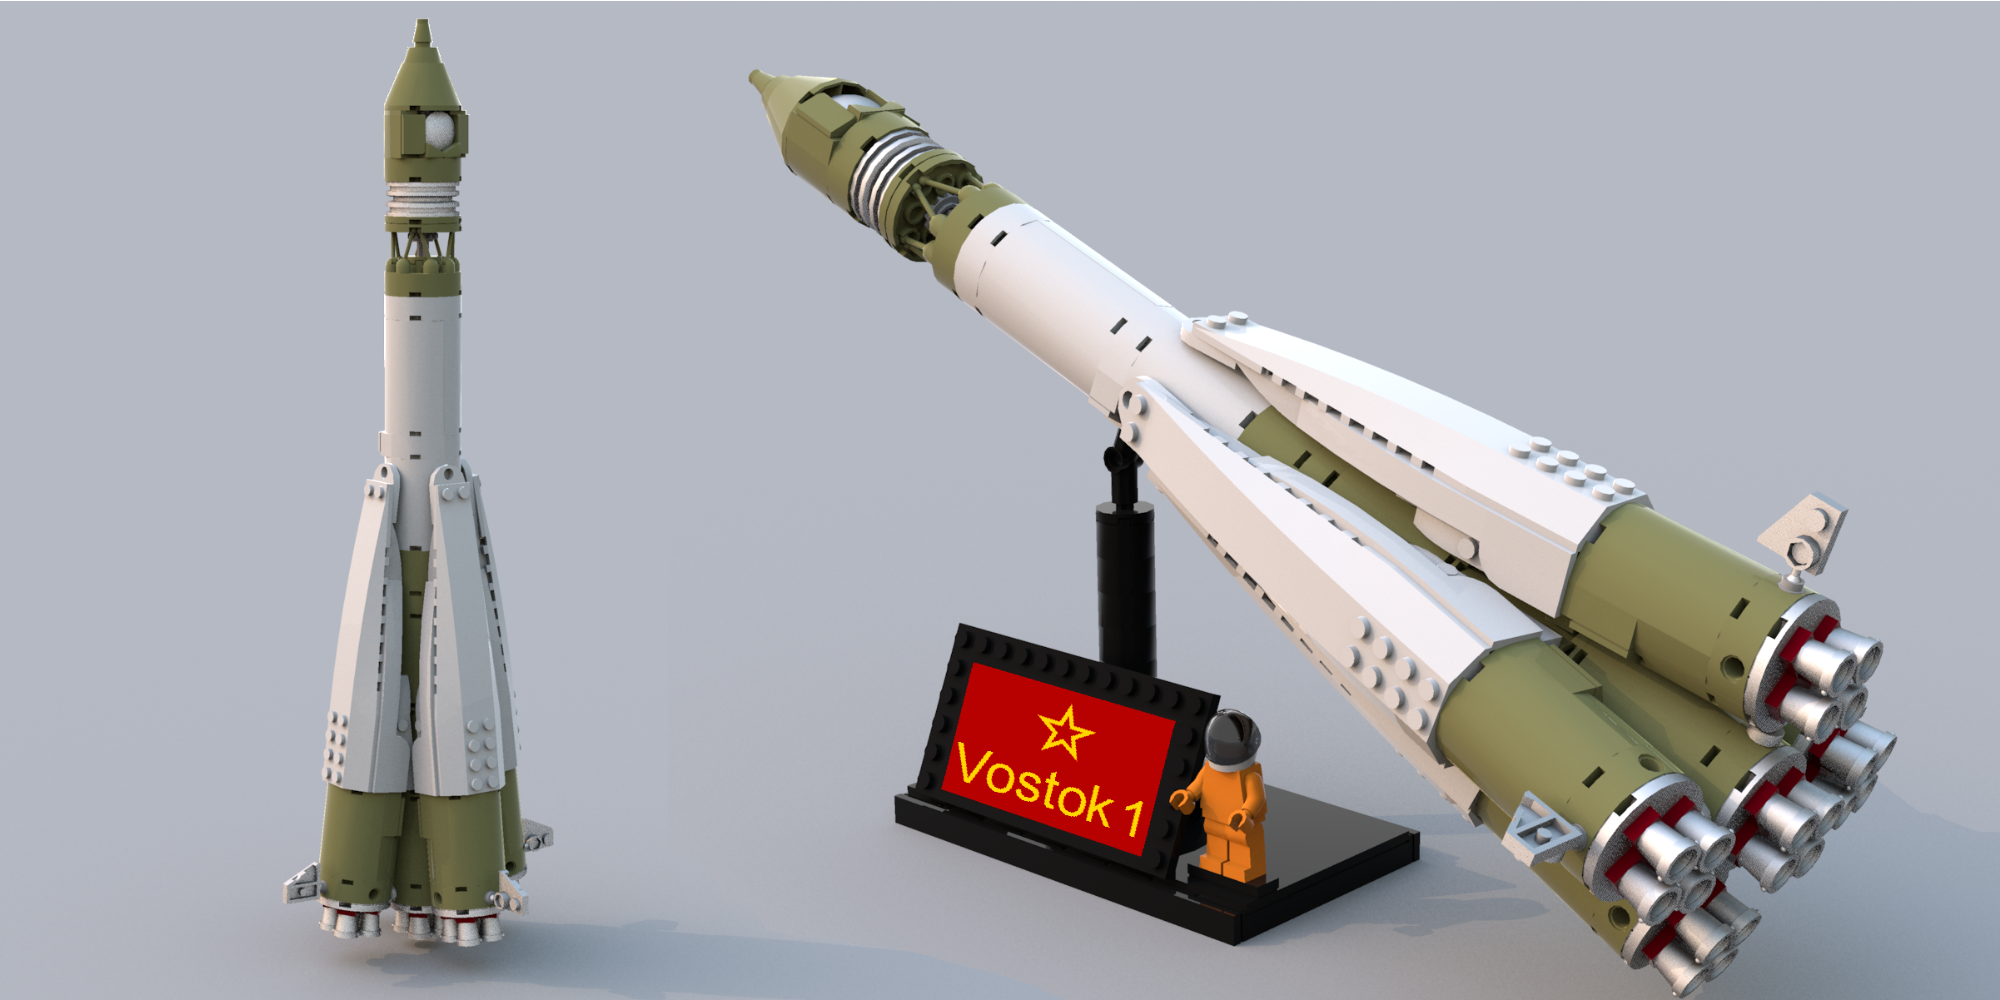 Vostok 1 space